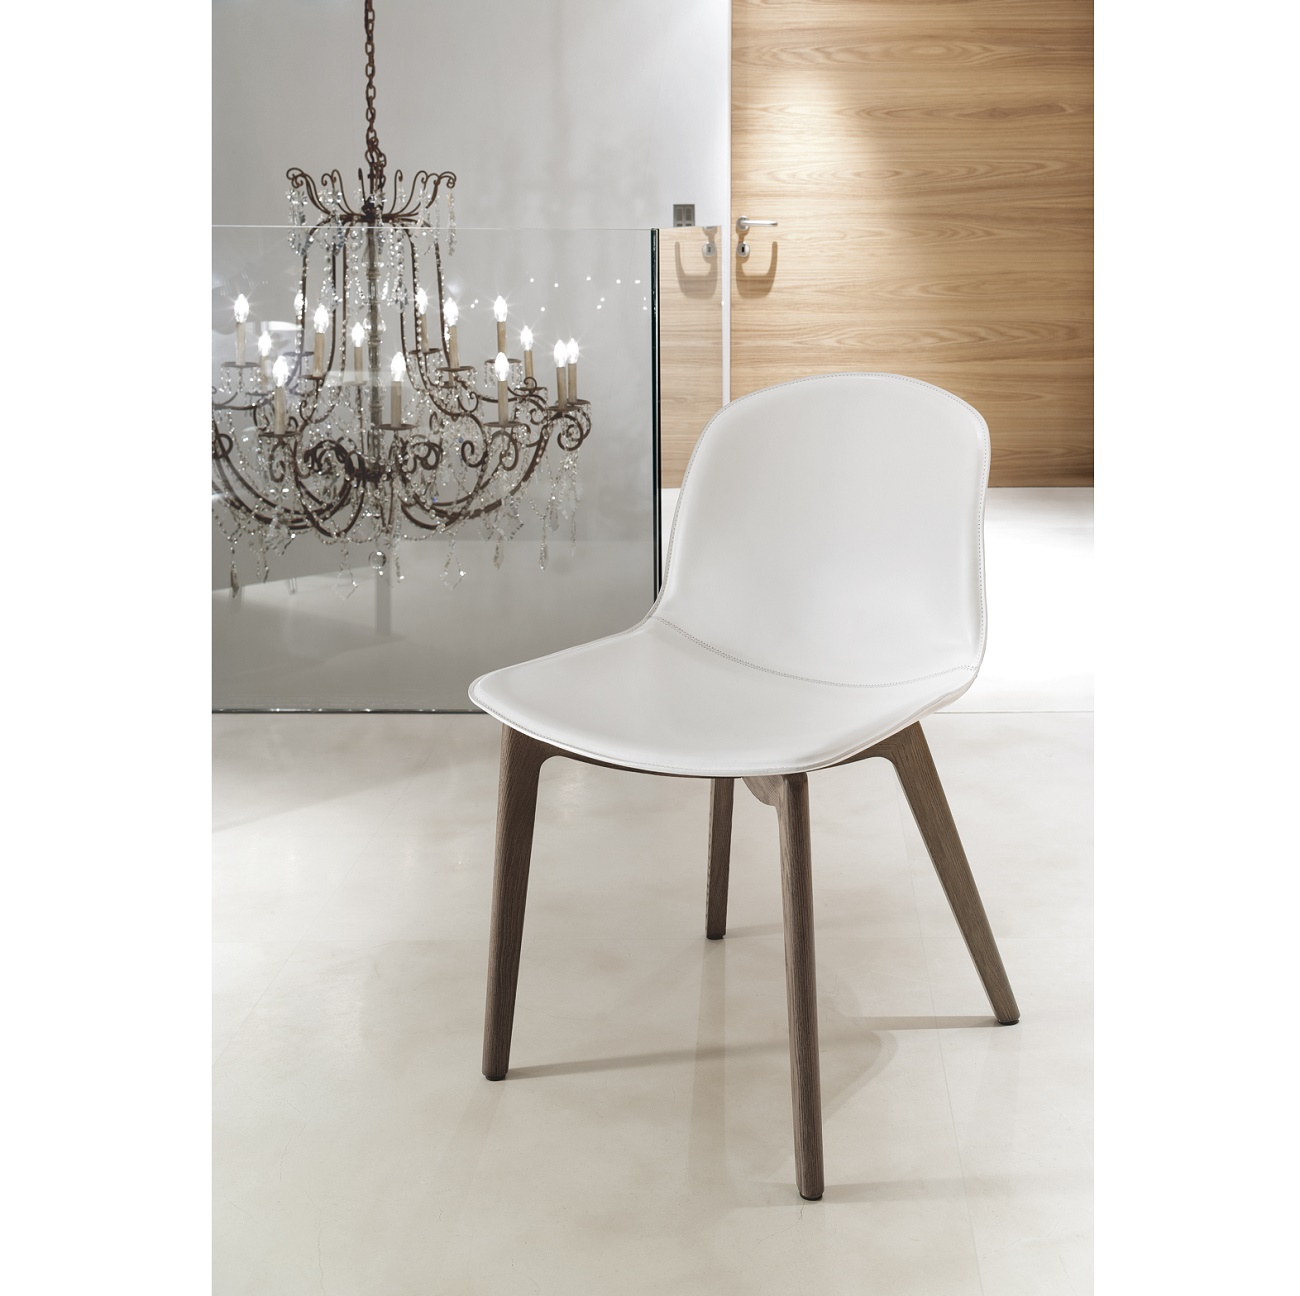 Seventy chair / Wood Legs, Bontempi CASA Dining Chairs, Brooklyn, New York, Furniture by ABD